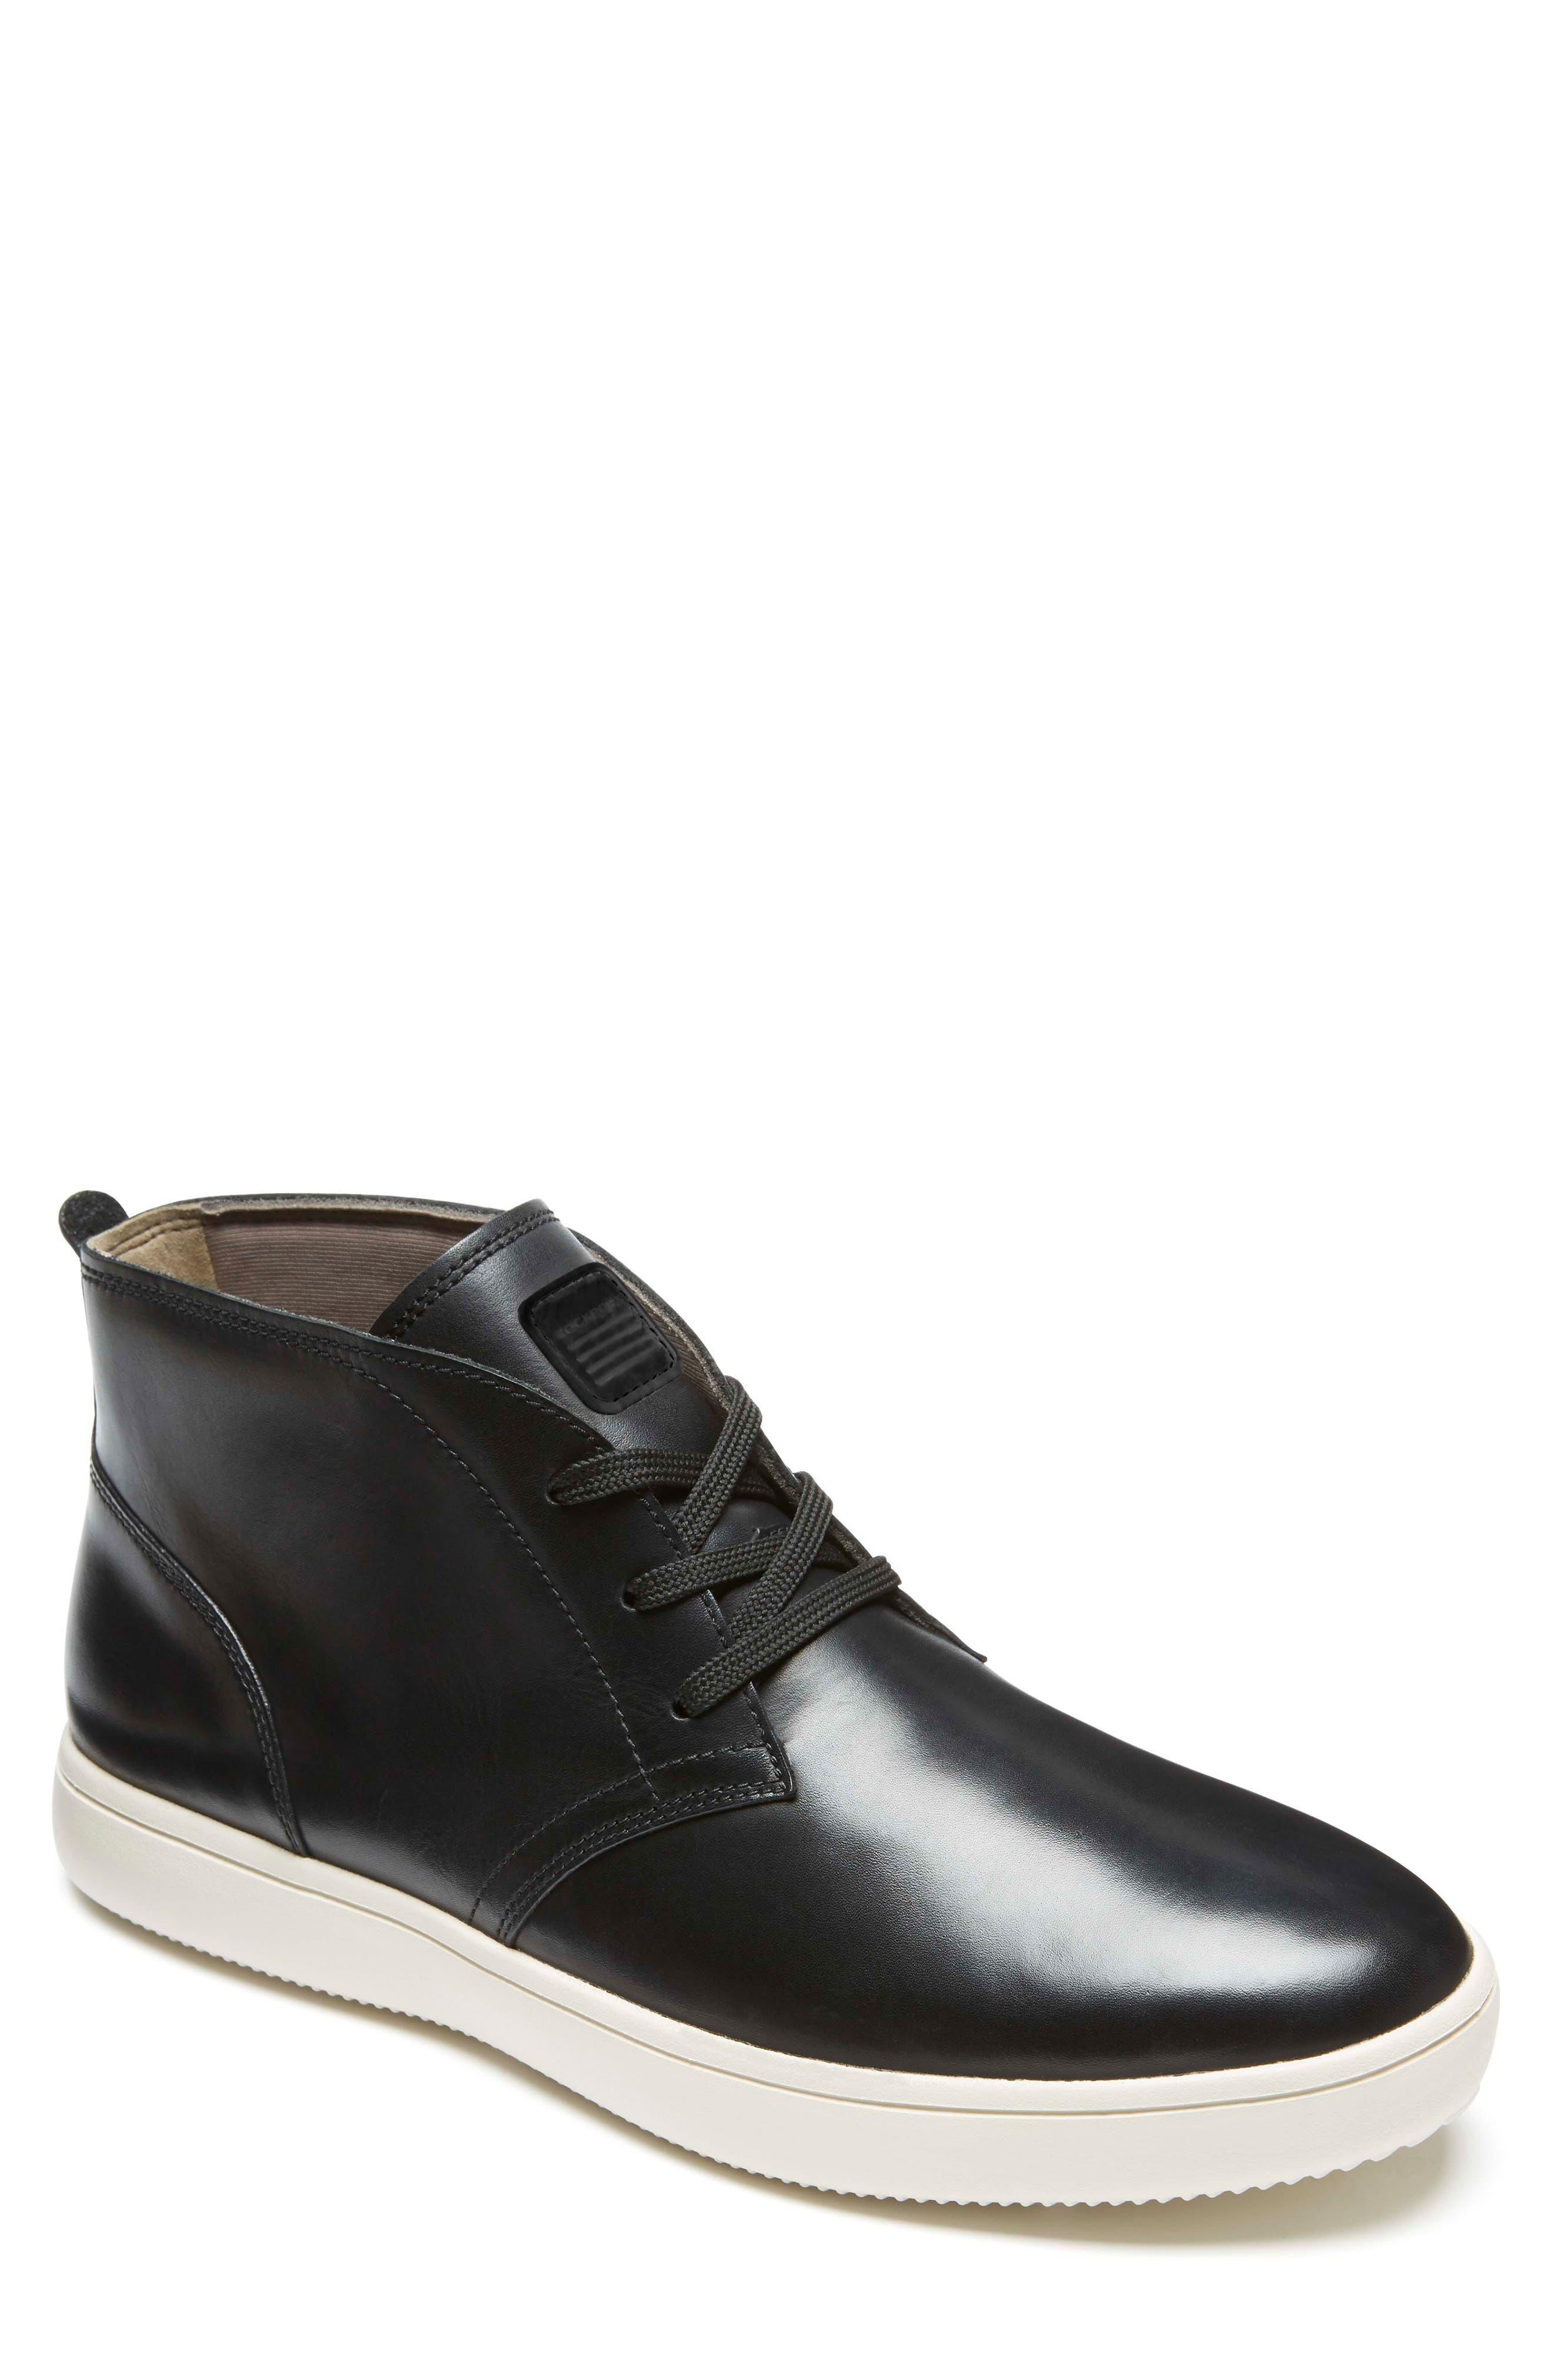 Rockport Colle Chukka Boot, Black